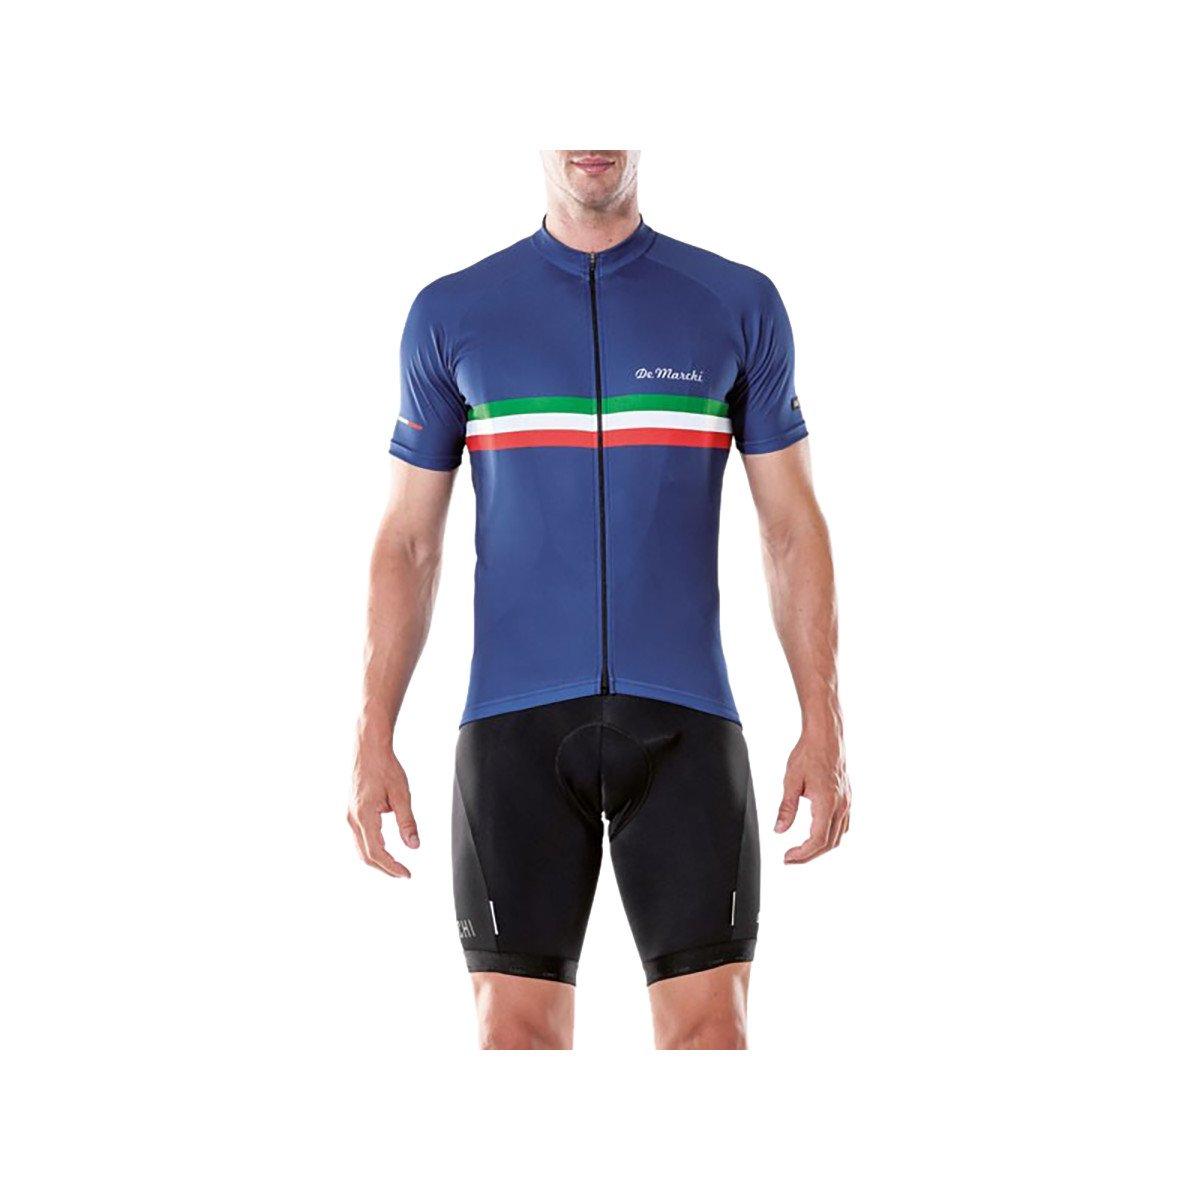 430eda600 Amazon.com  De Marchi PT Jersey - Short-Sleeve - Men s Royal